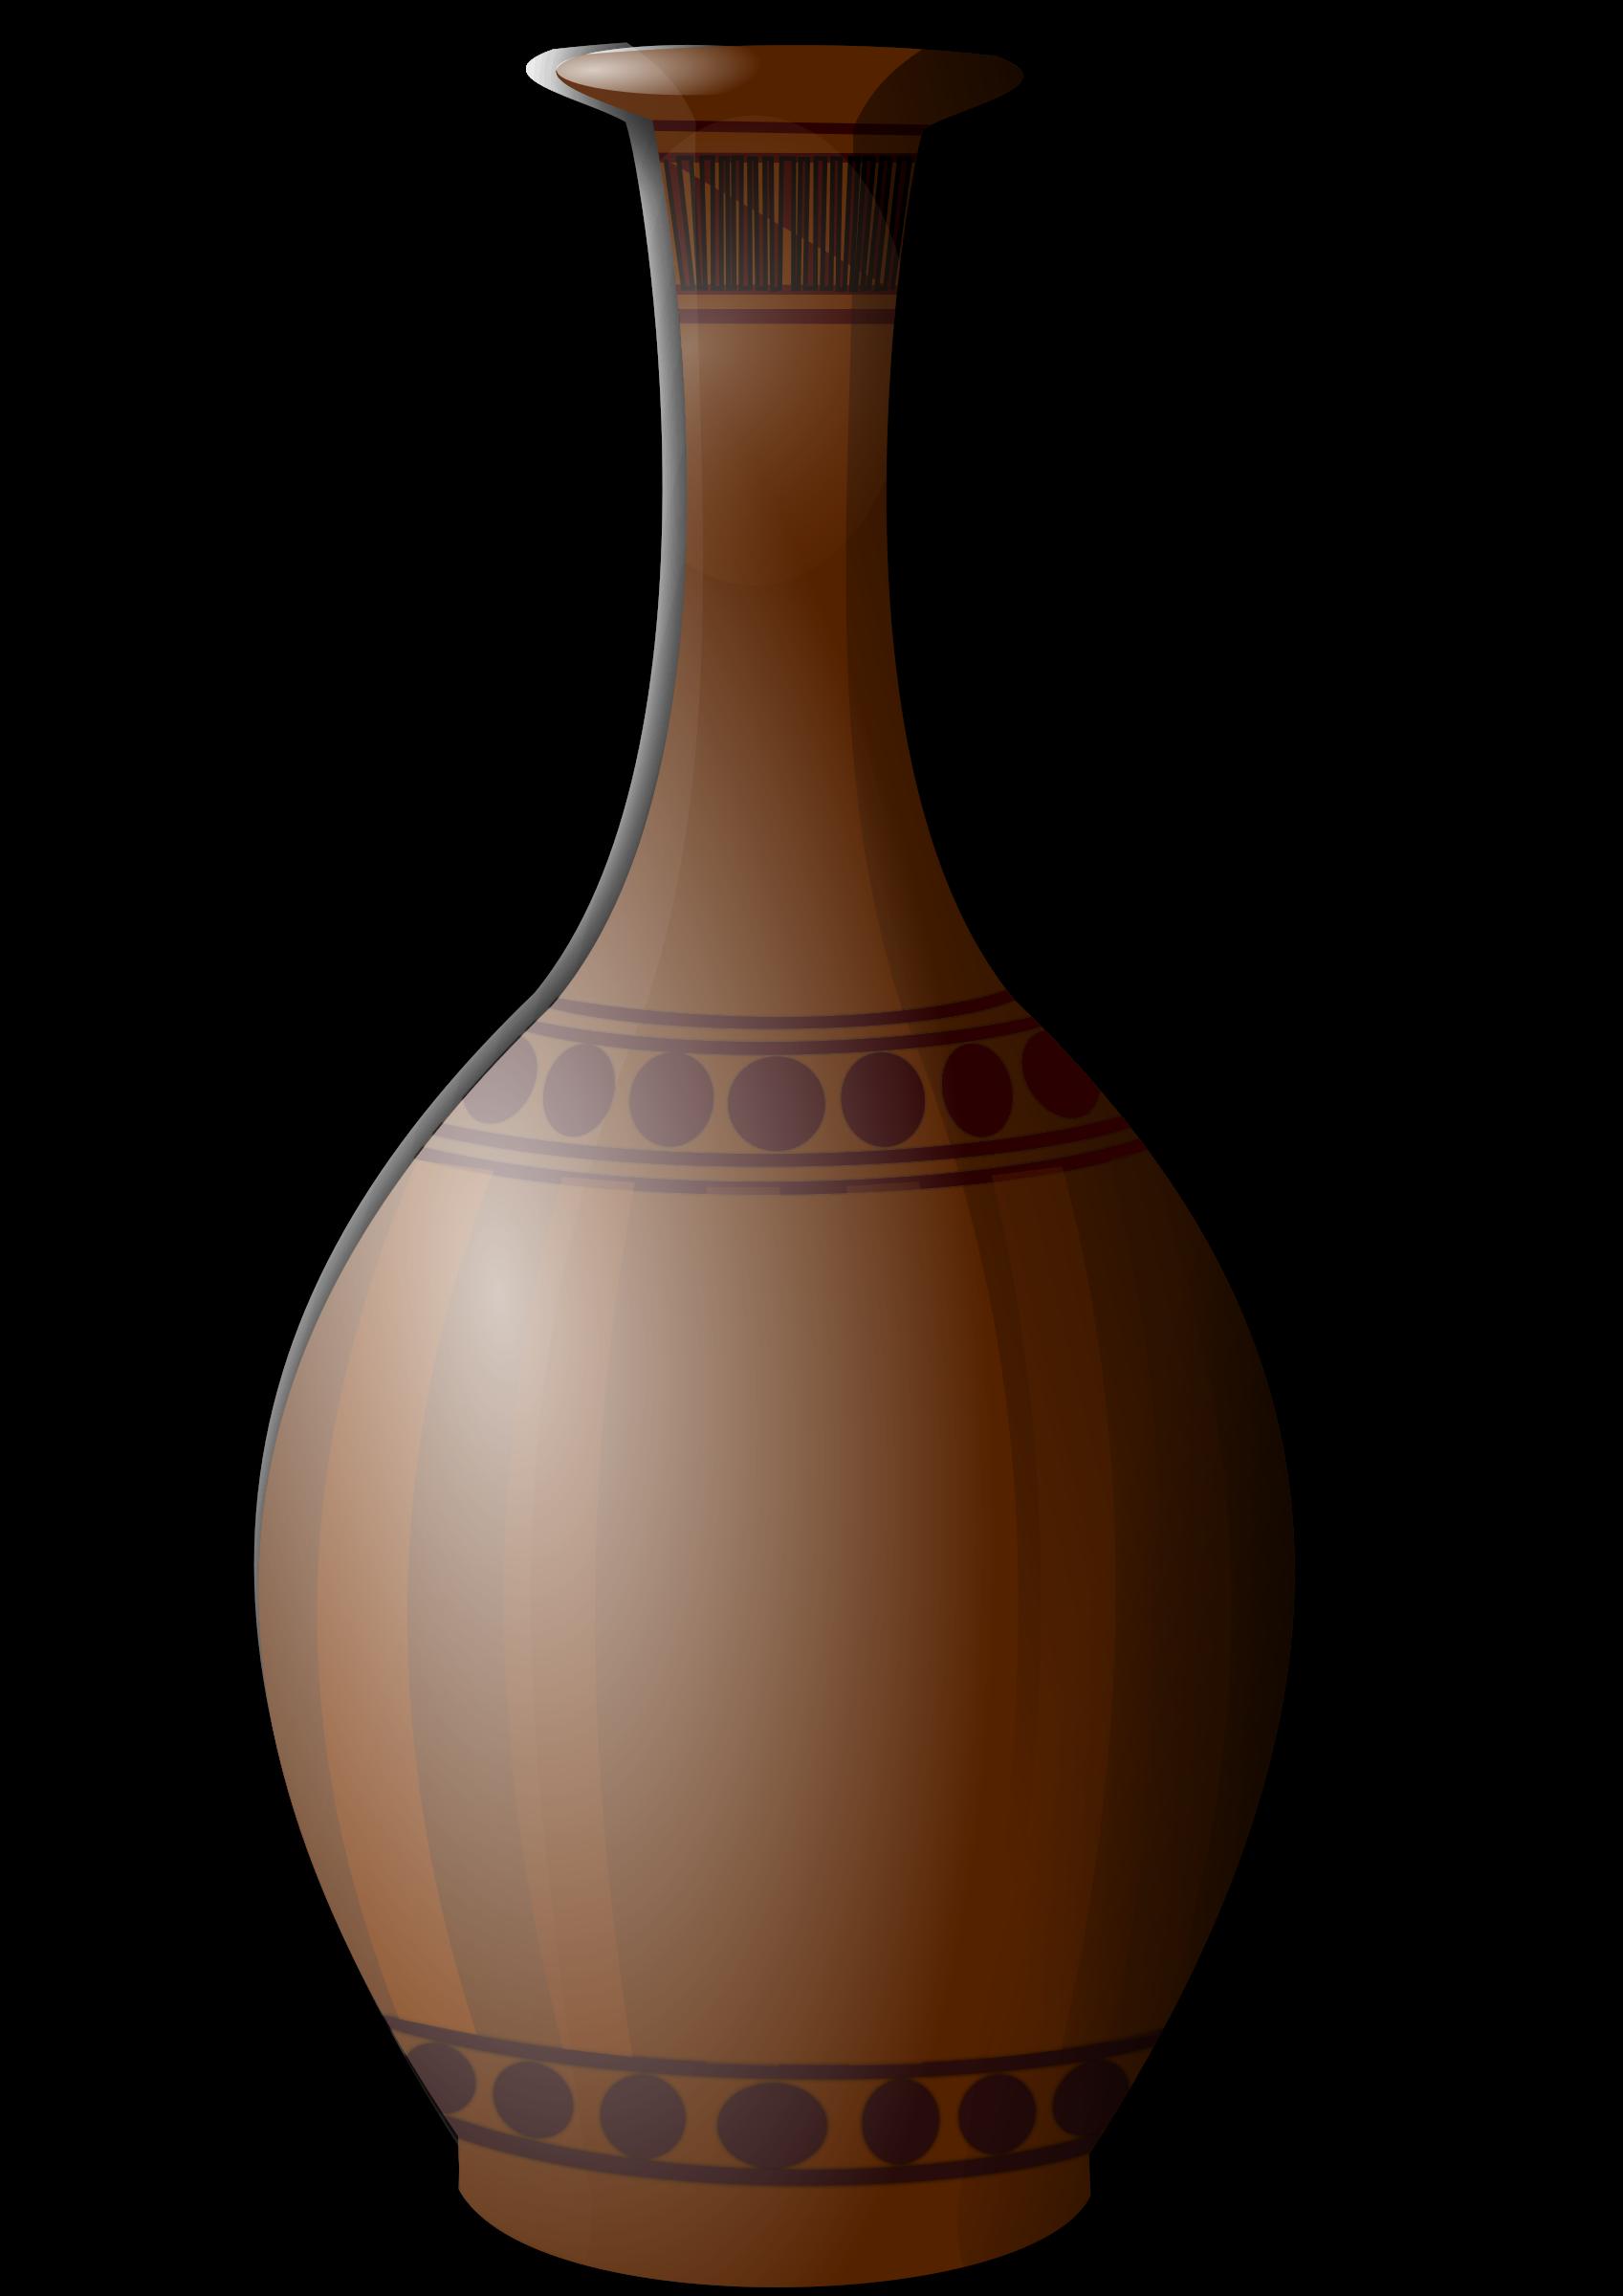 Antique vases clipart #3